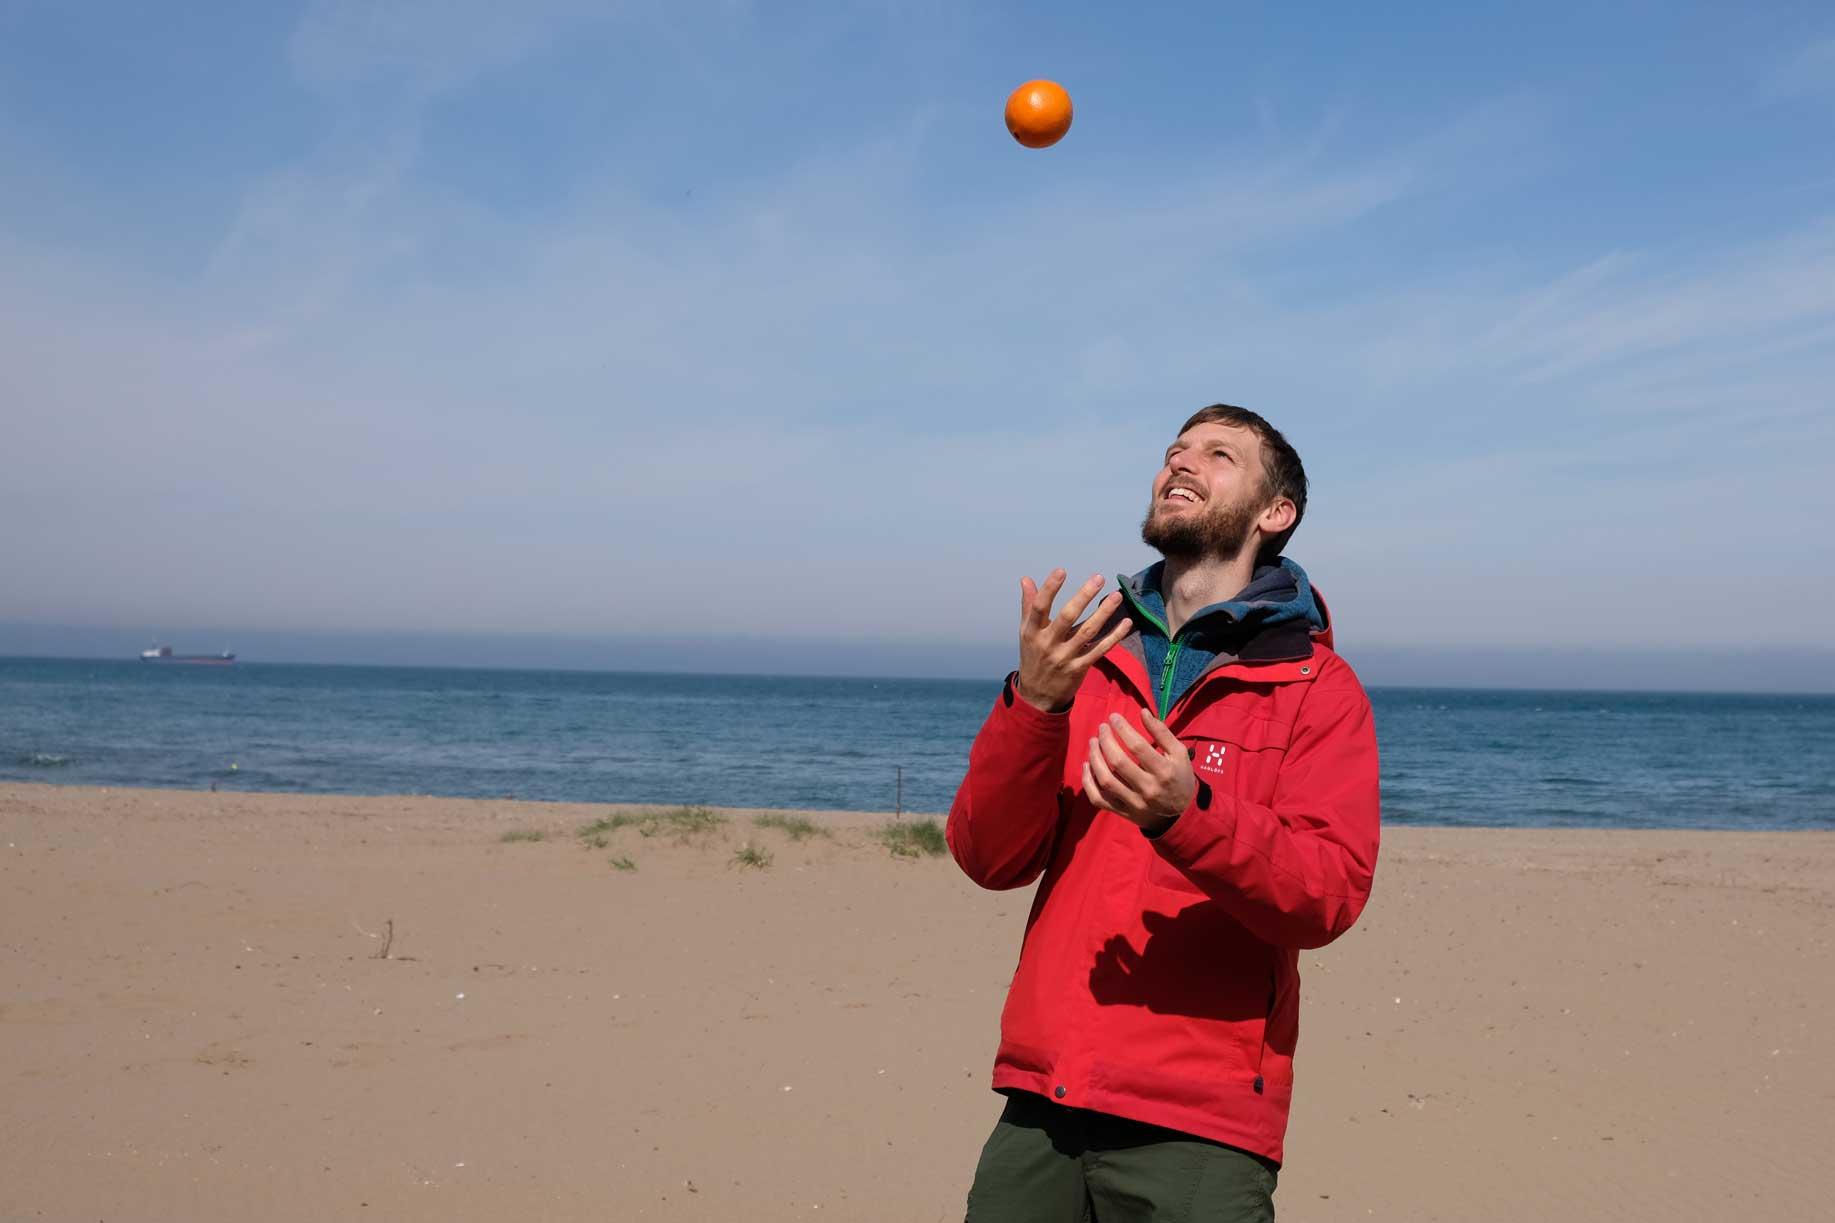 Sebastian jongliert am Strand